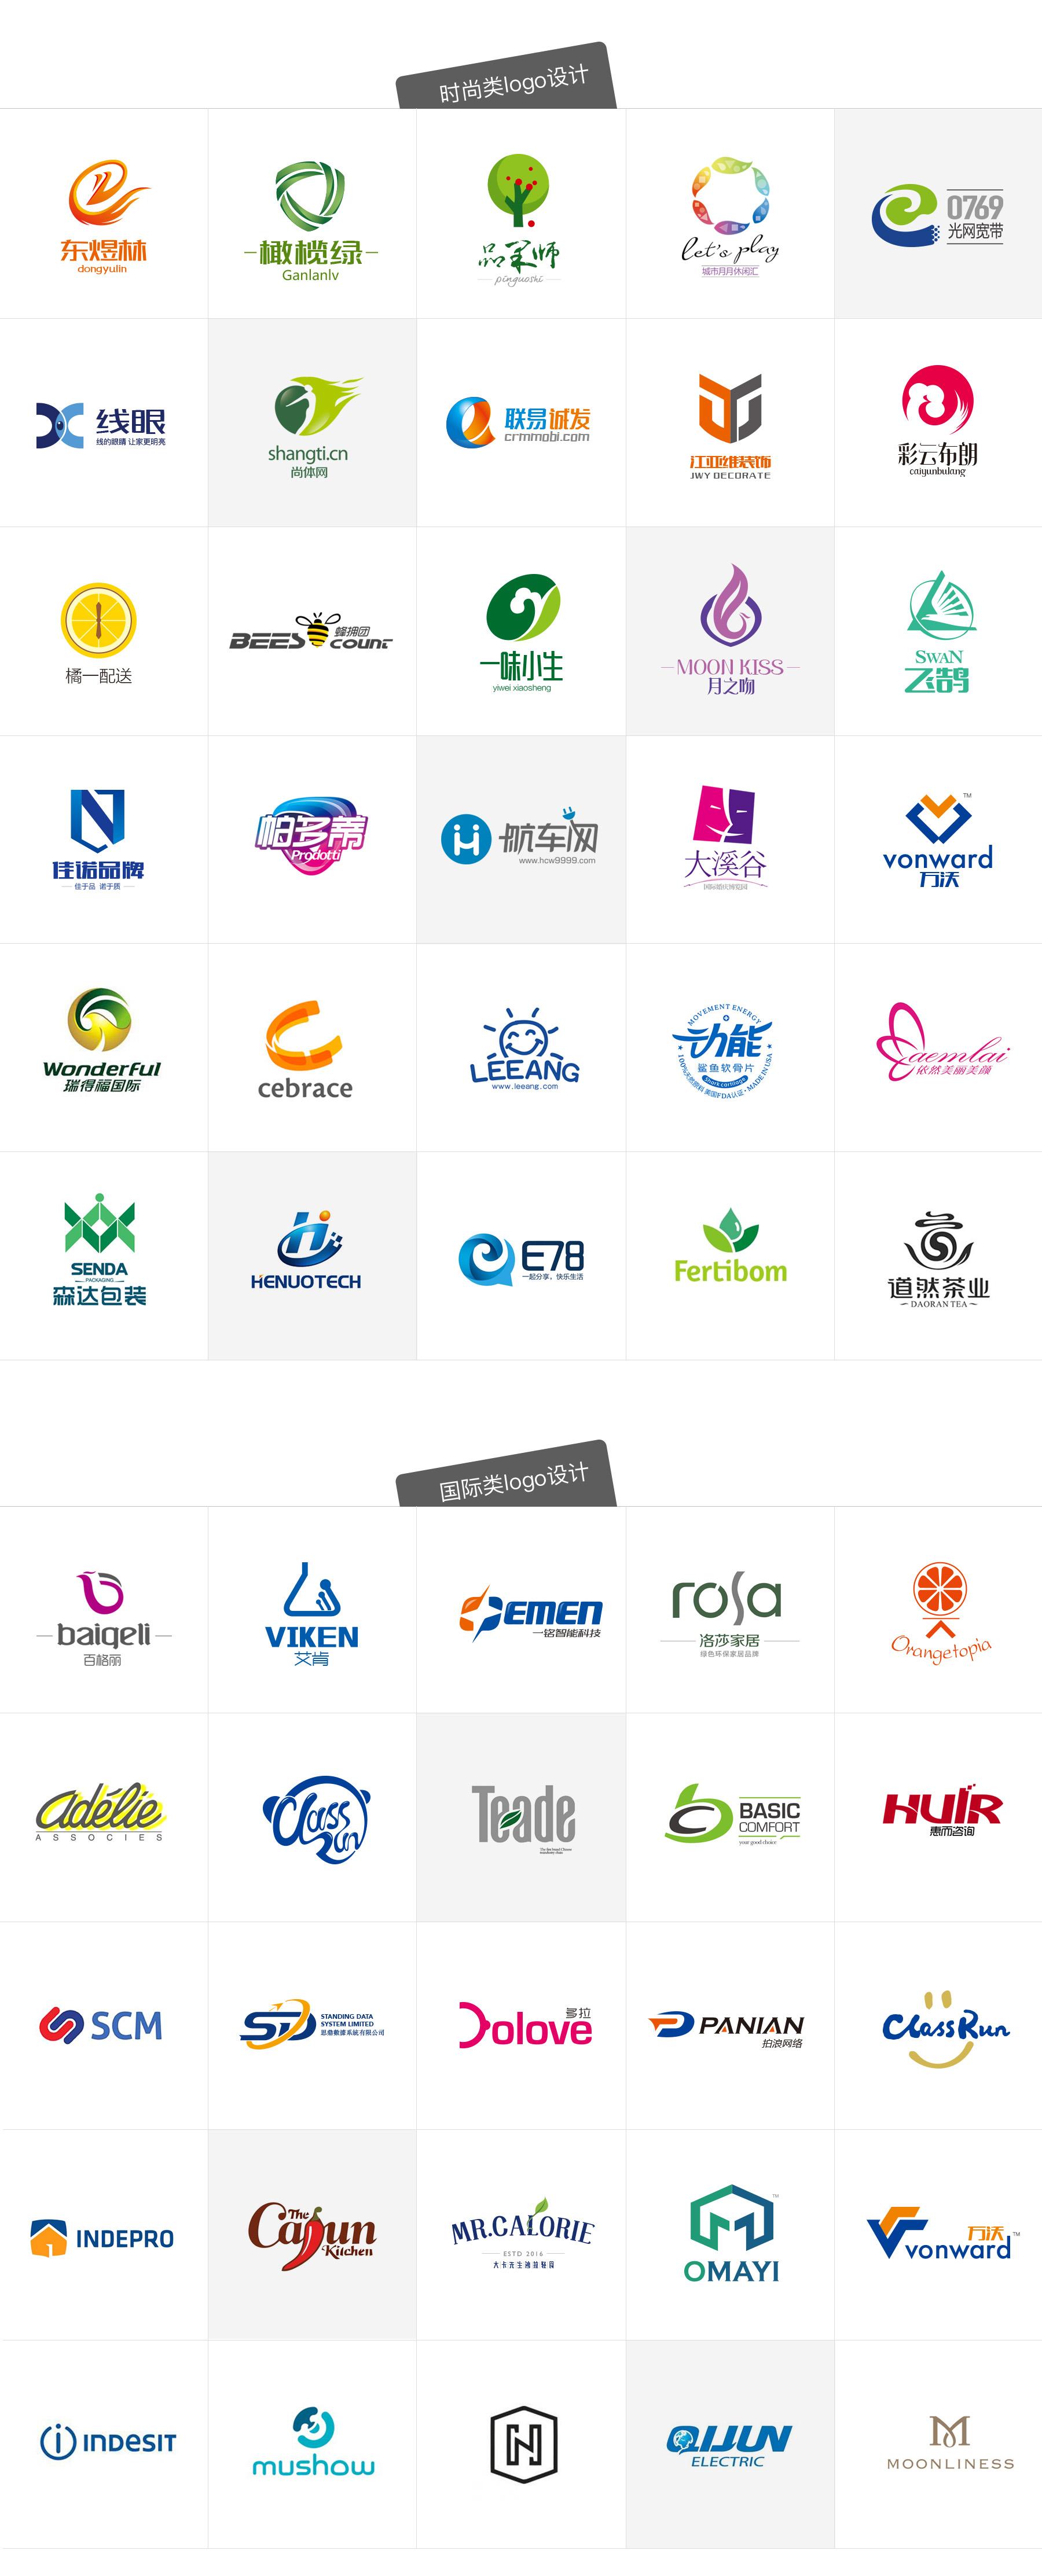 LOGO_logo公司餐饮网站品牌酒店教育卡通图标标志商标LOGO设计6